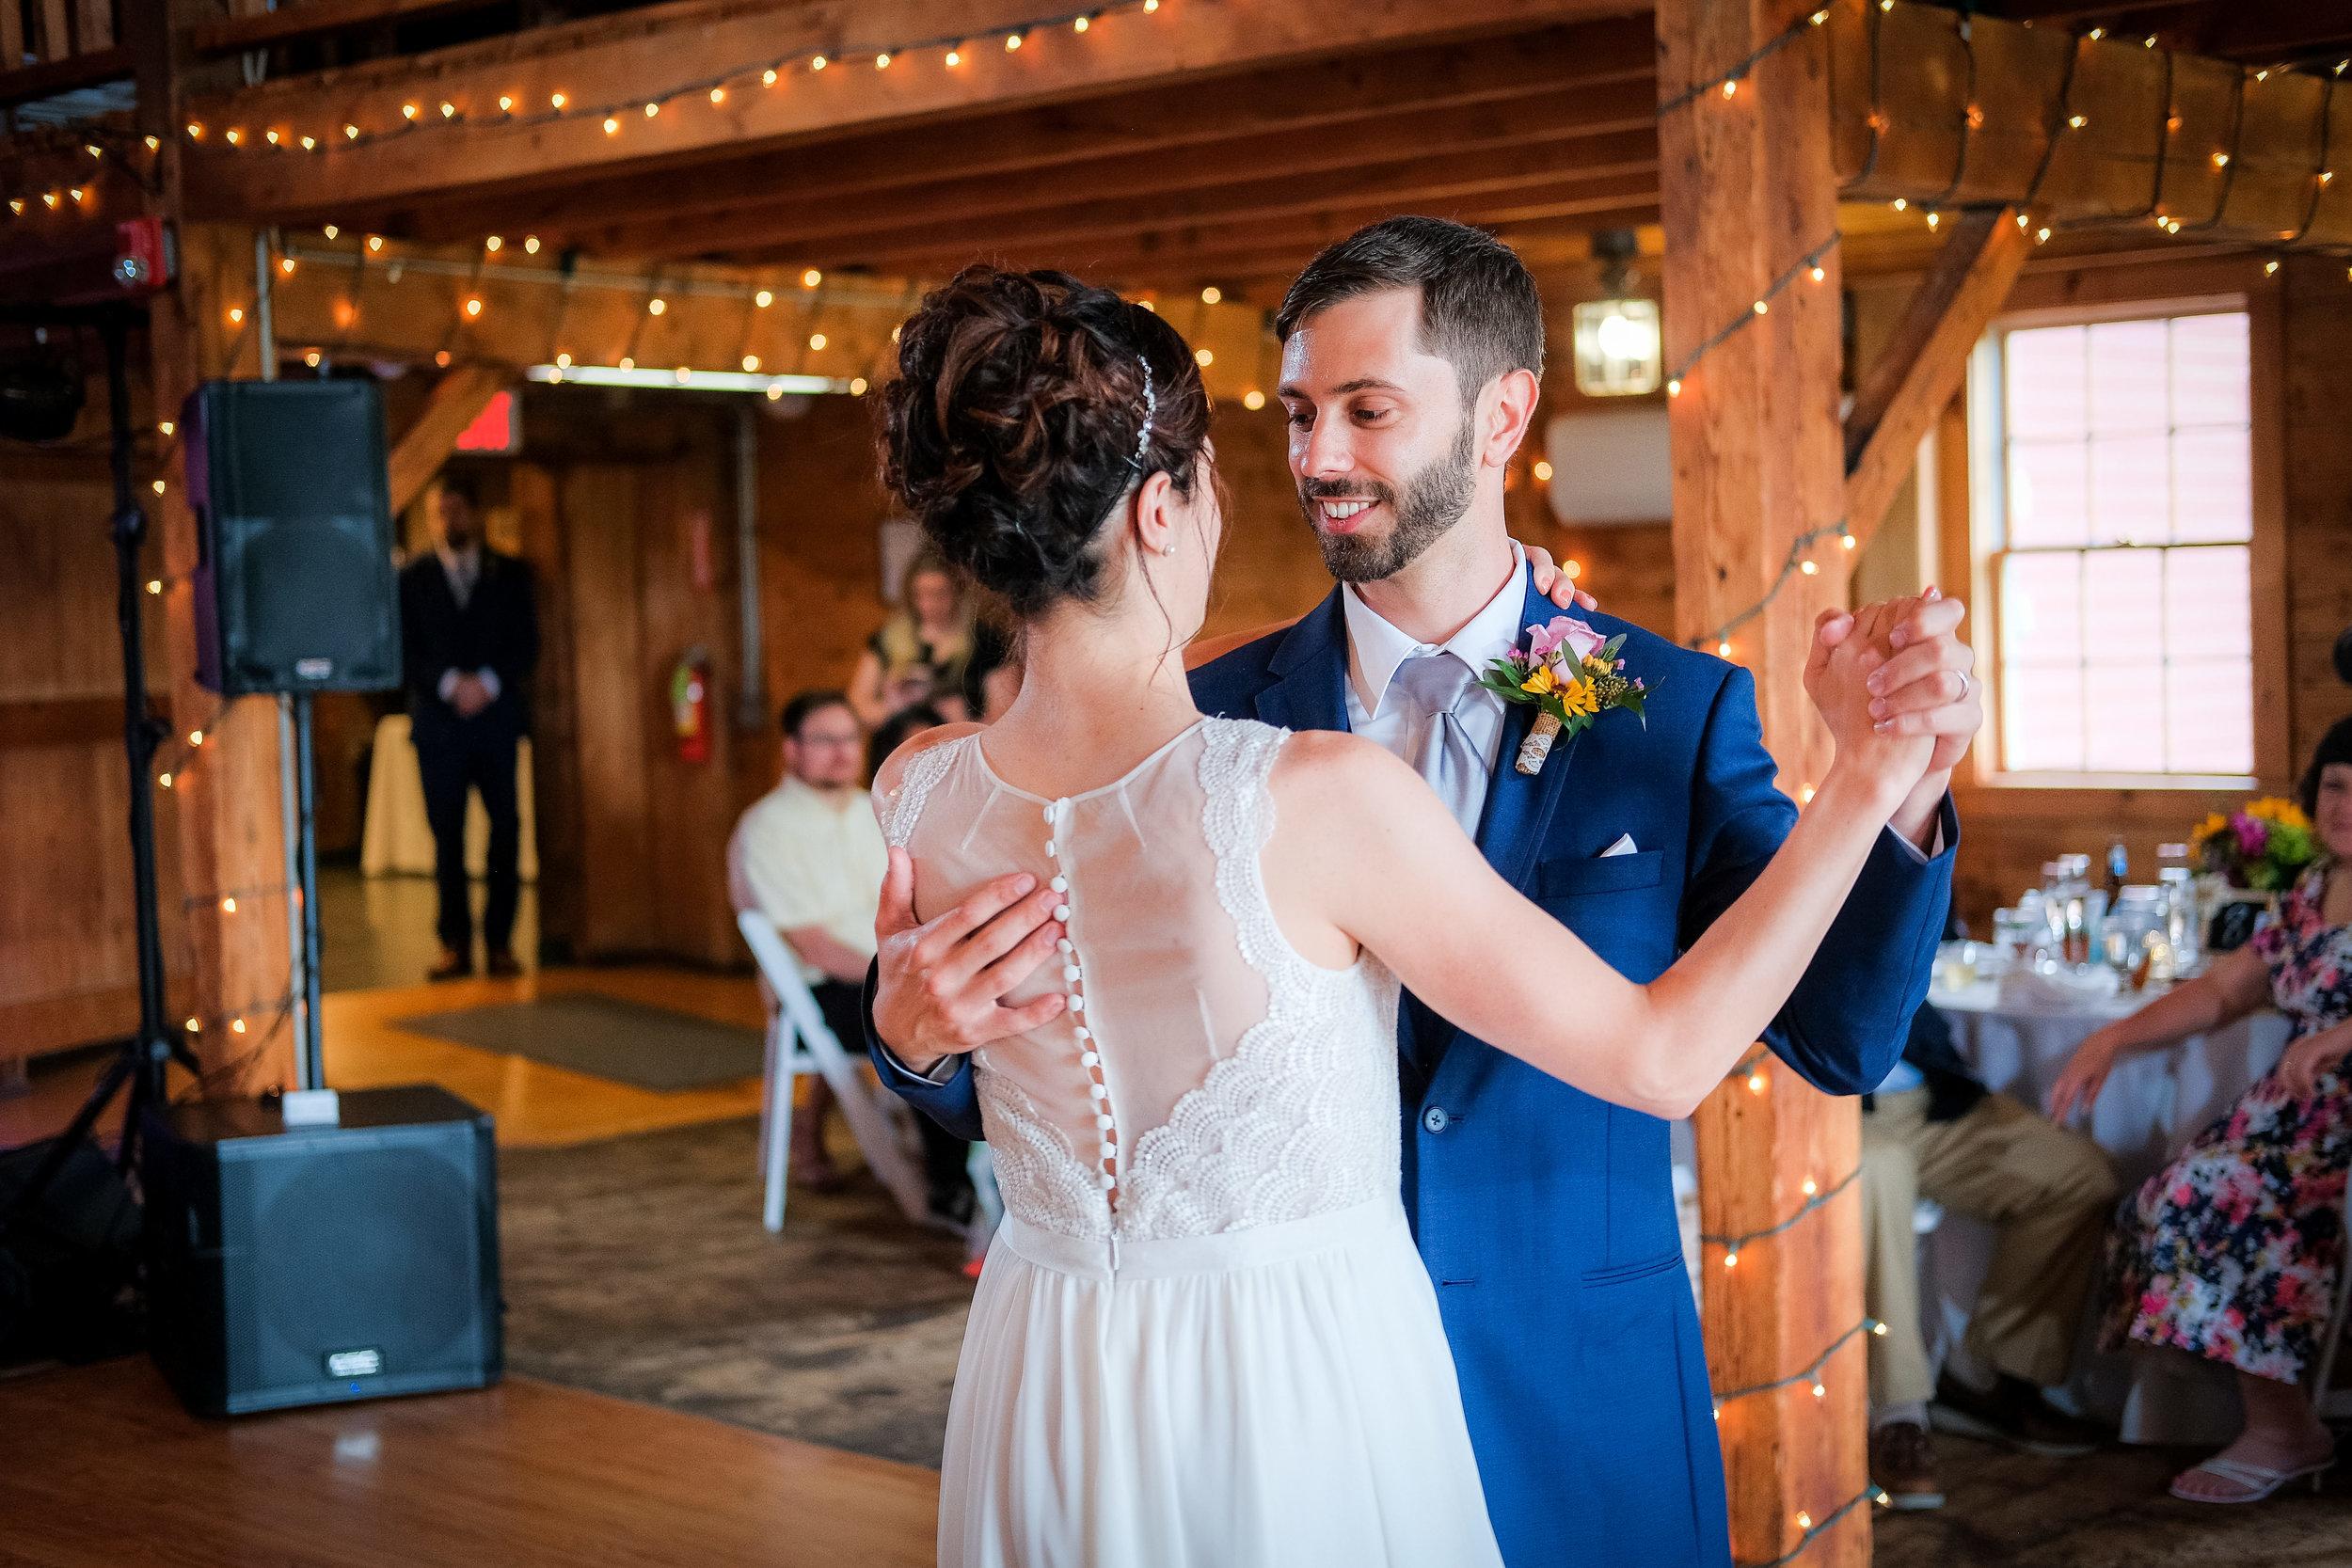 Peabody-Smith-Barn-Wedding-Photography-24.jpg